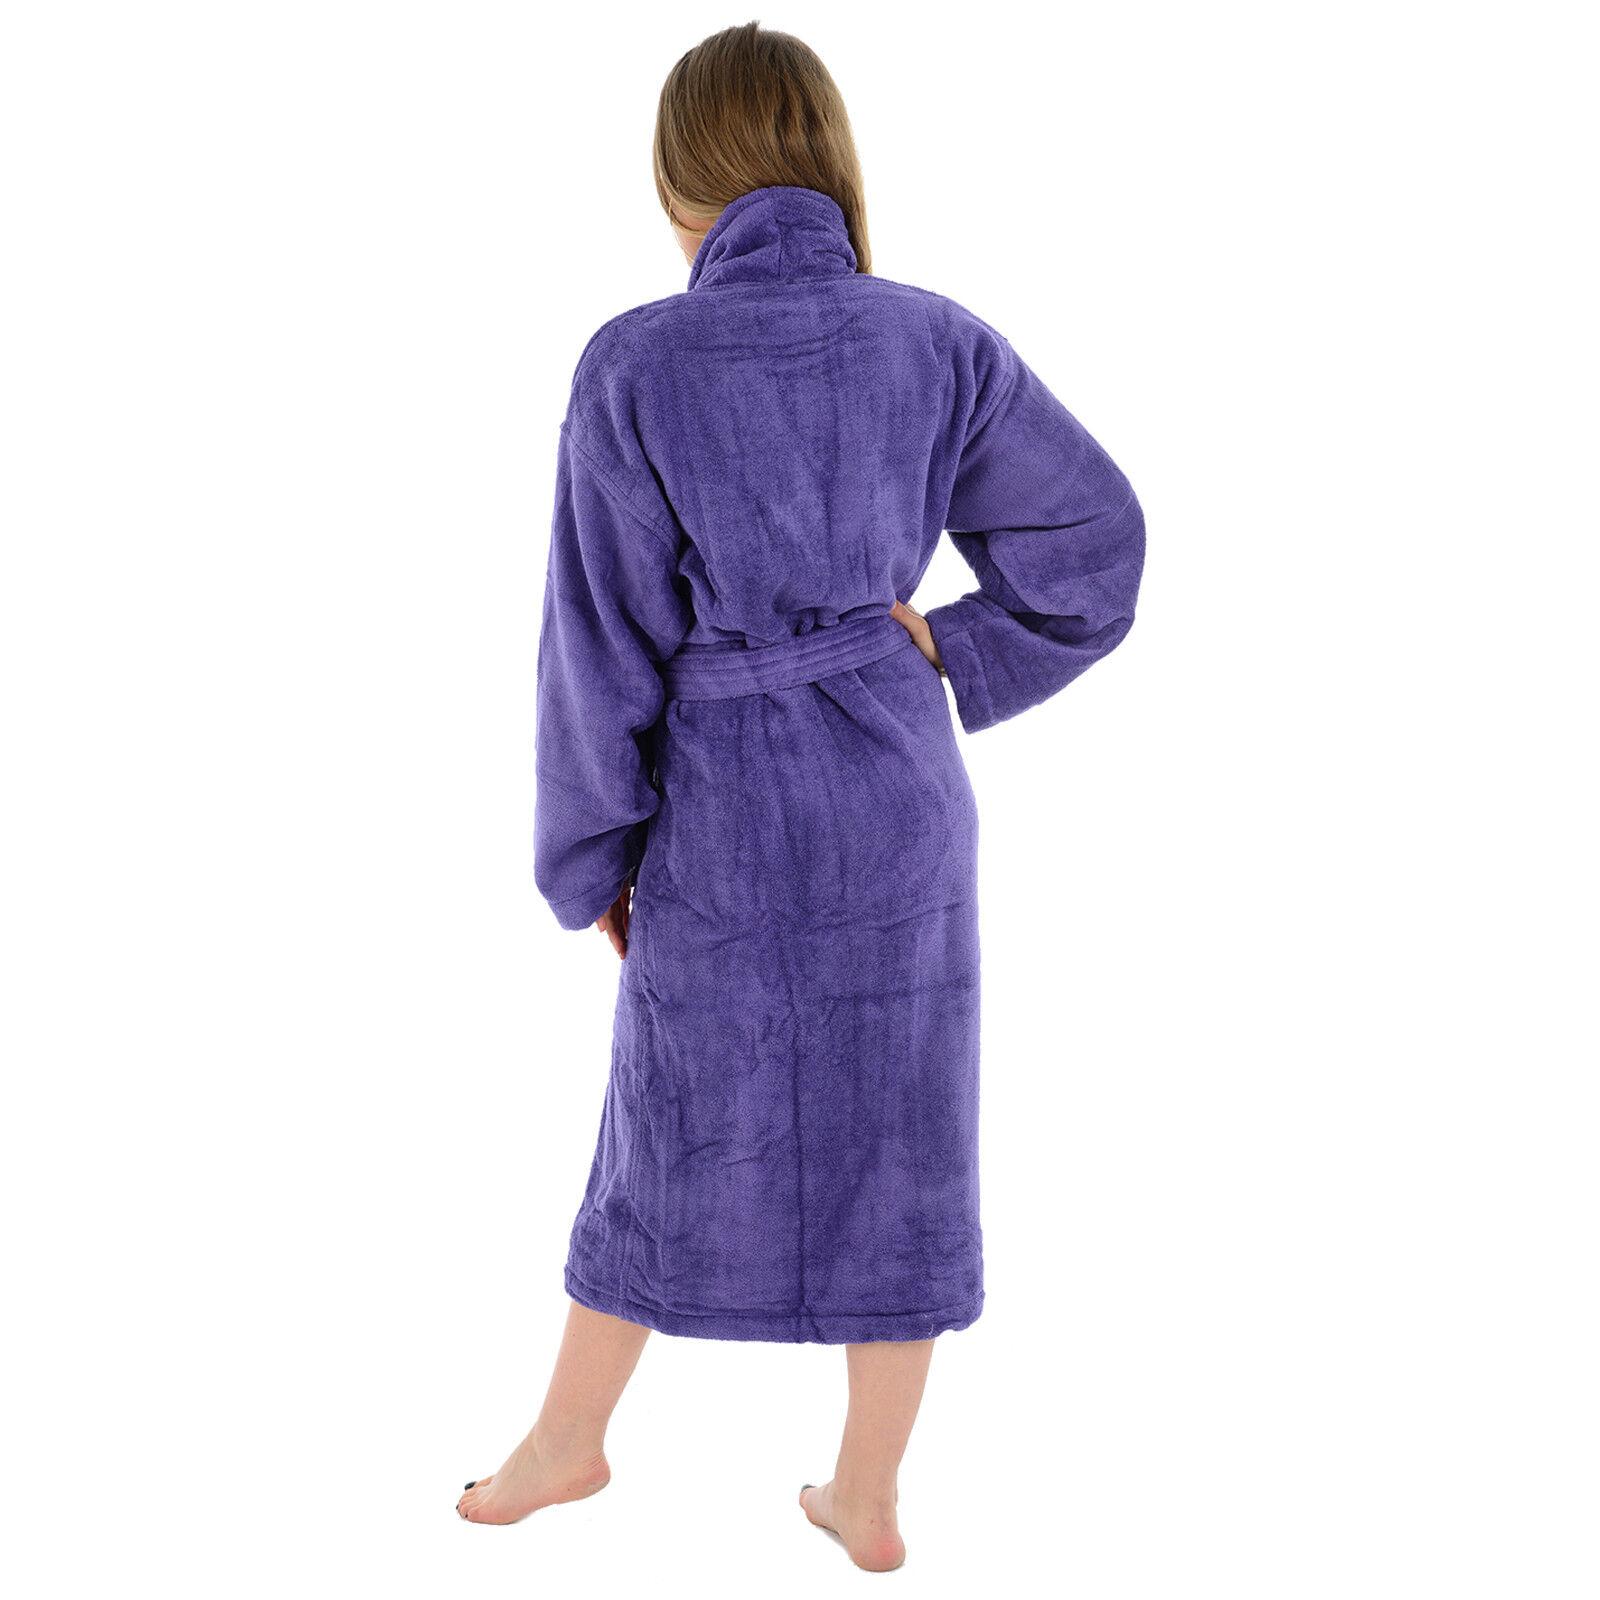 Unisex Egyptiaon Cotton Terry Towelling Bathrobe Luxury Dressing Gown Towel Soft